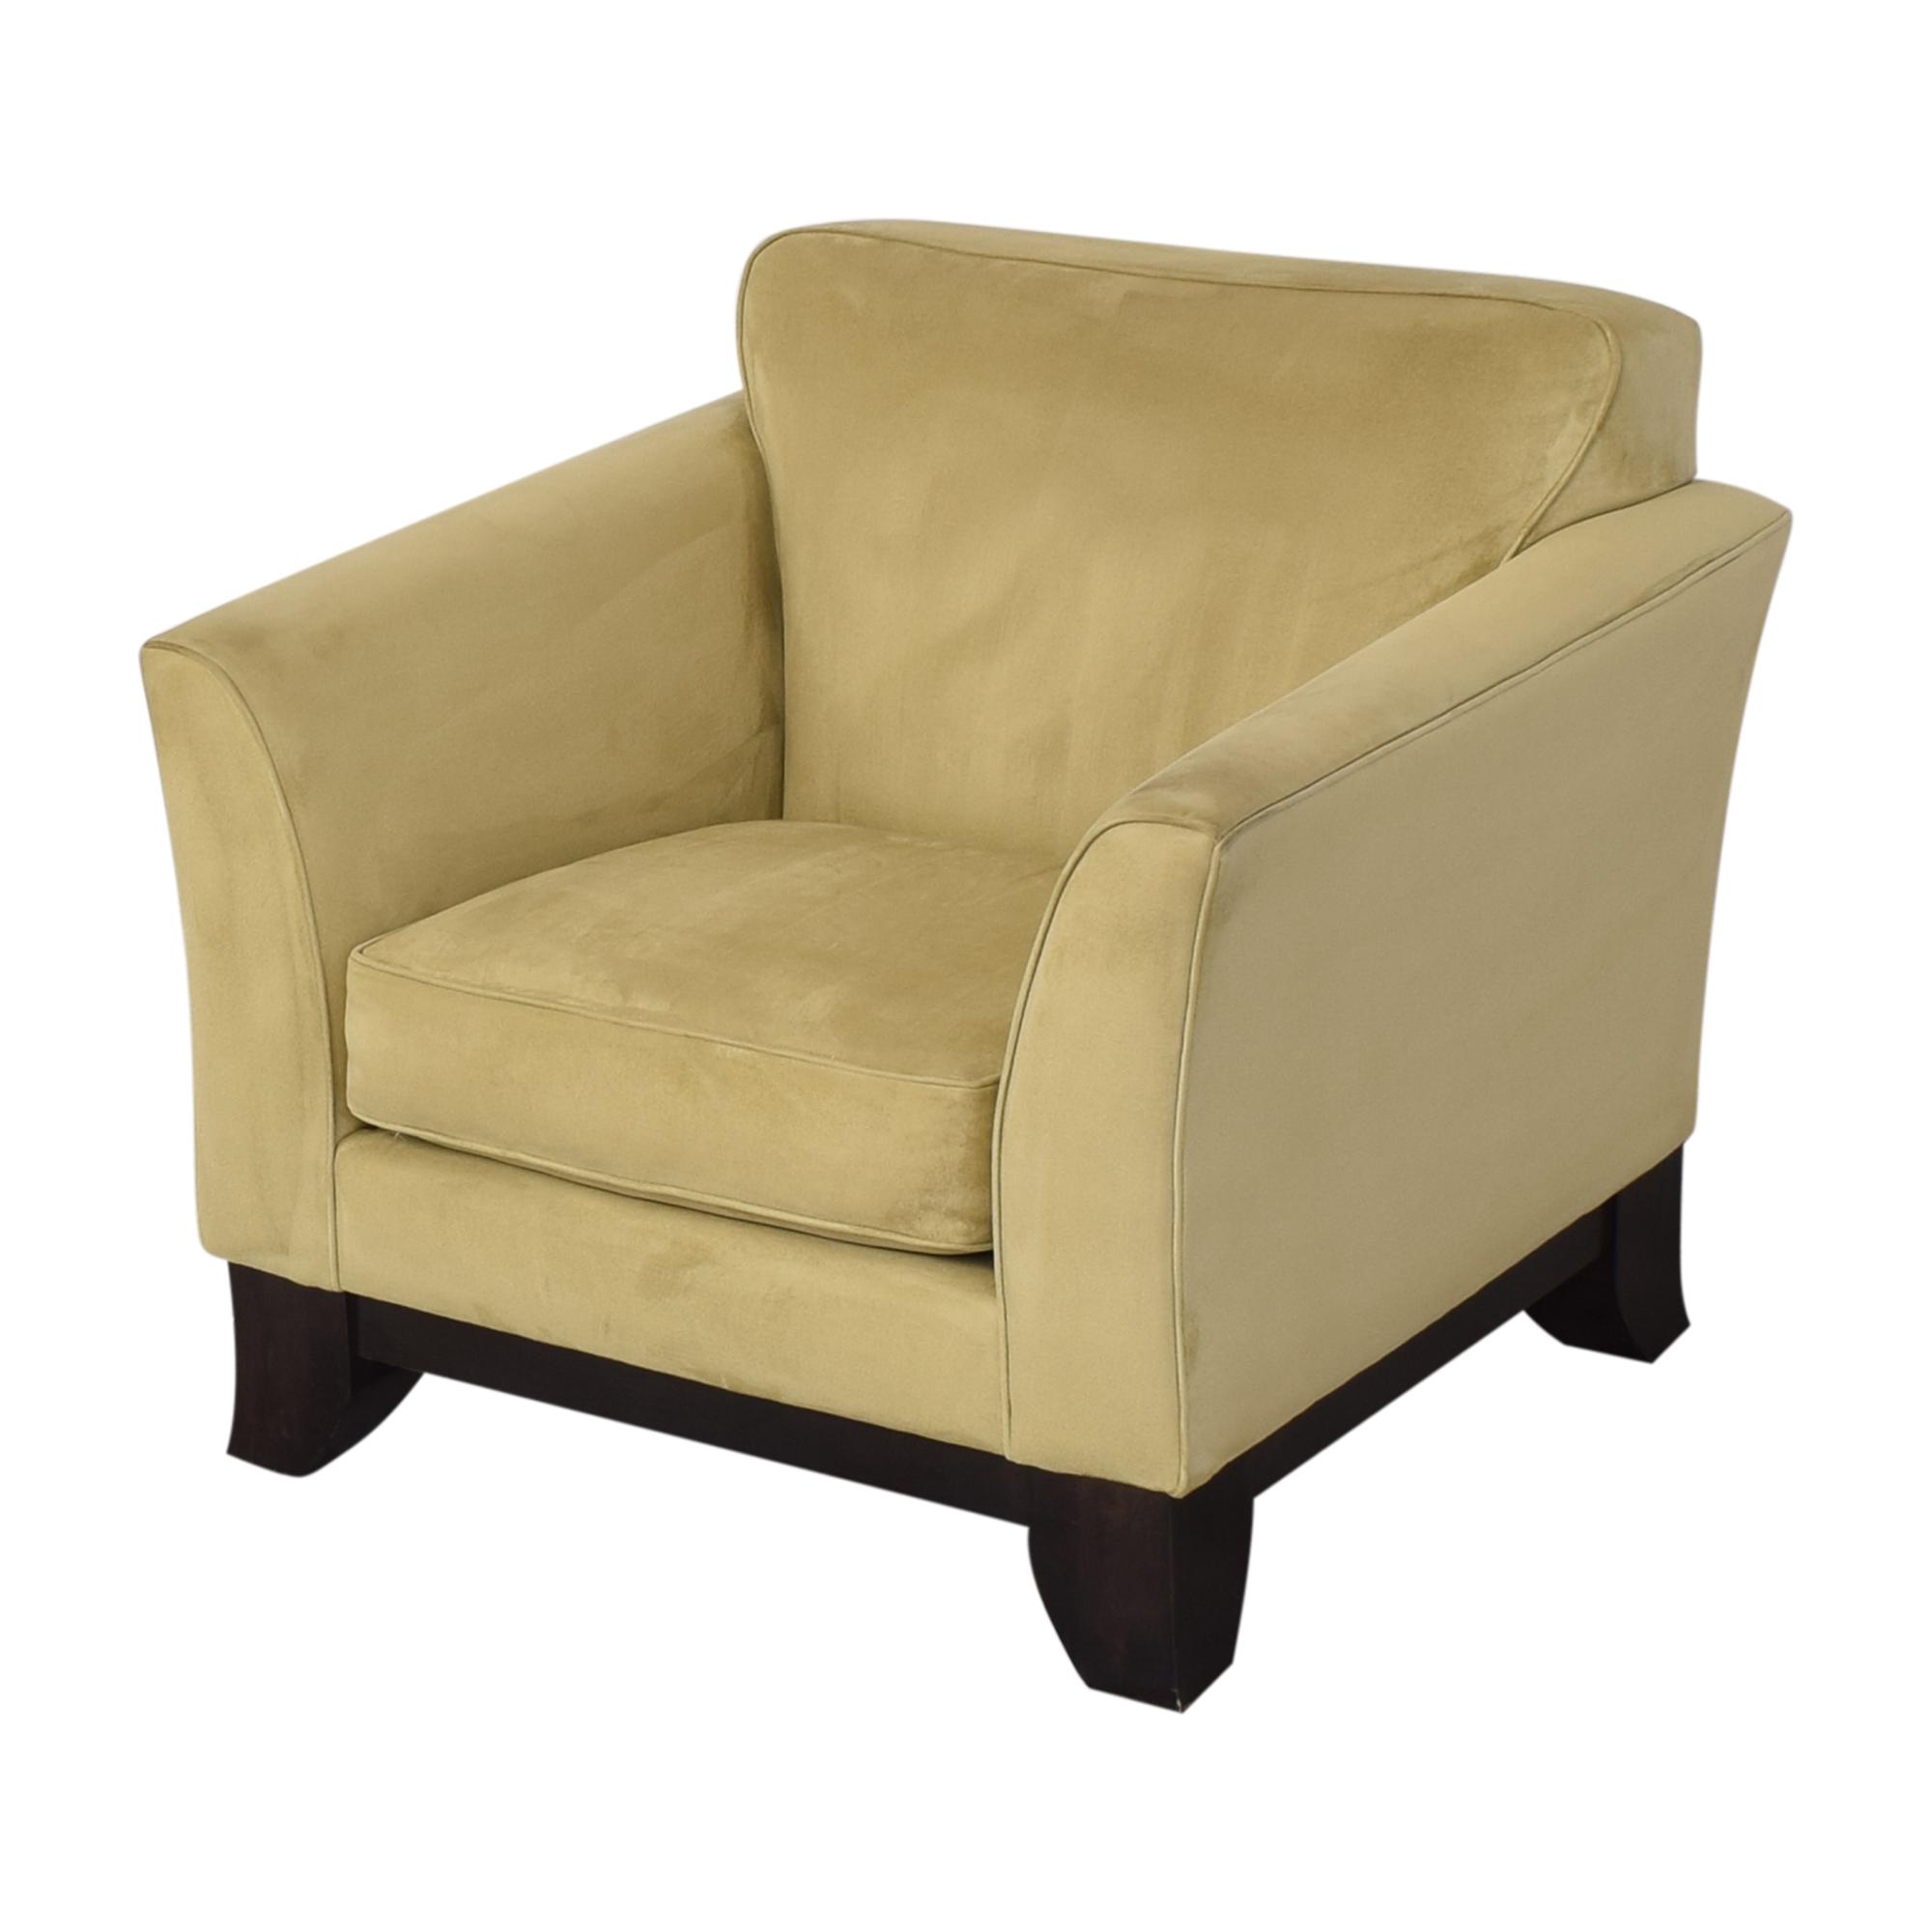 Pottery Barn Greenwich Chair / Chairs